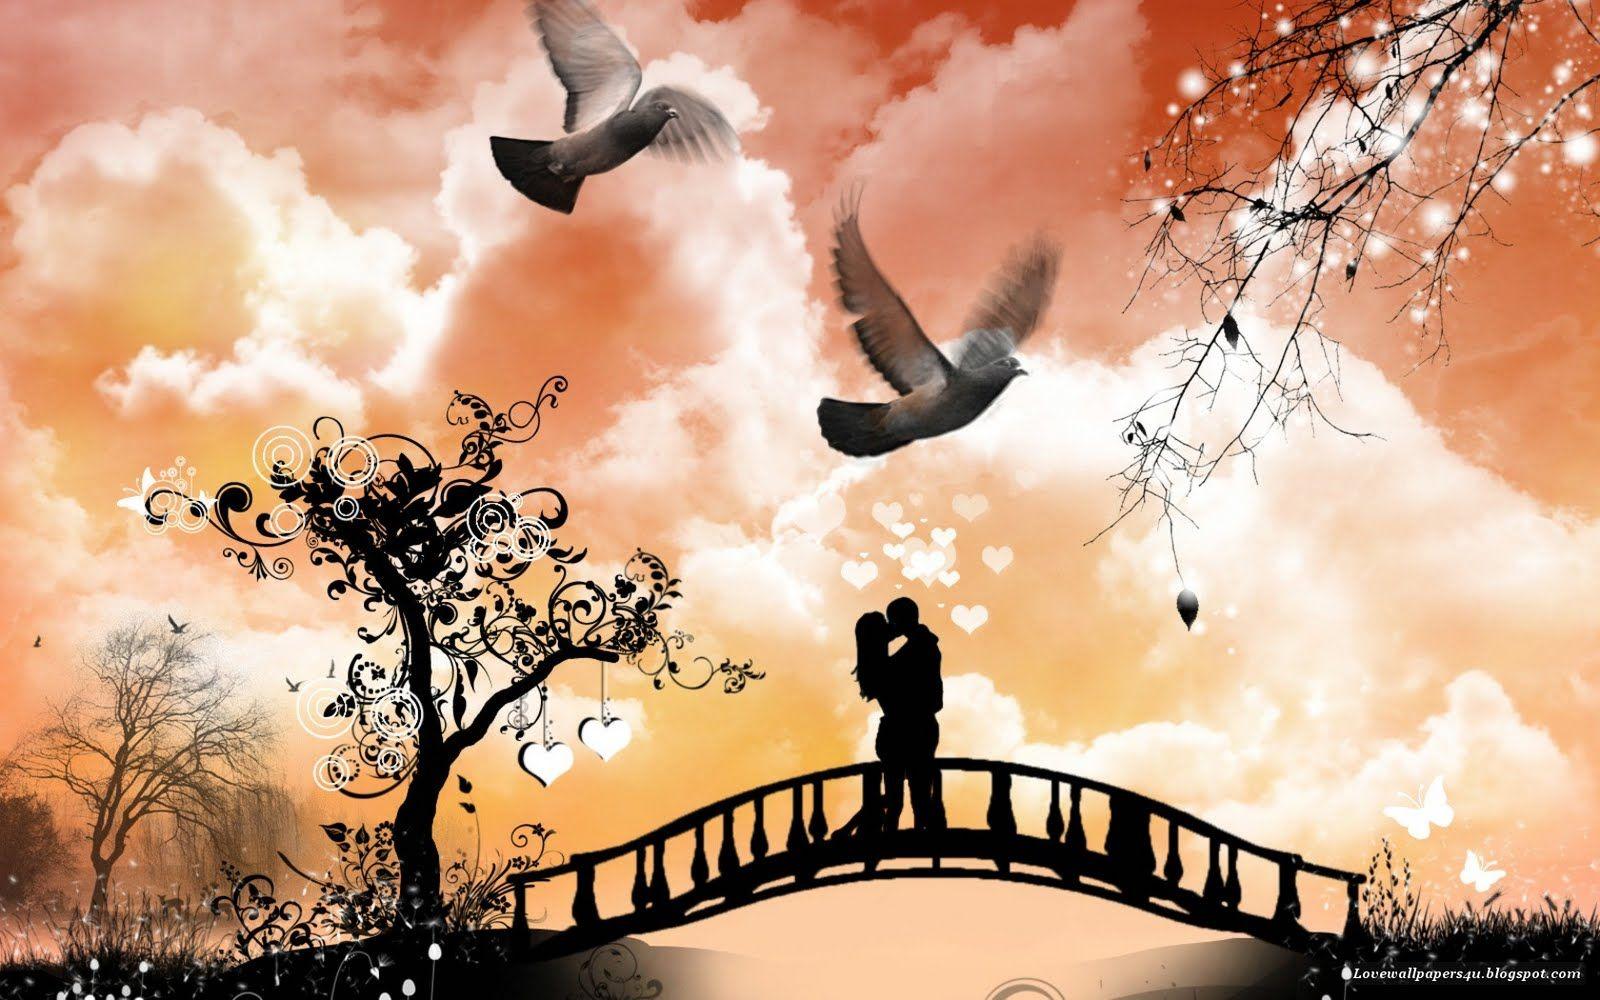 Wallpaper download hd love - Love Wallpaper